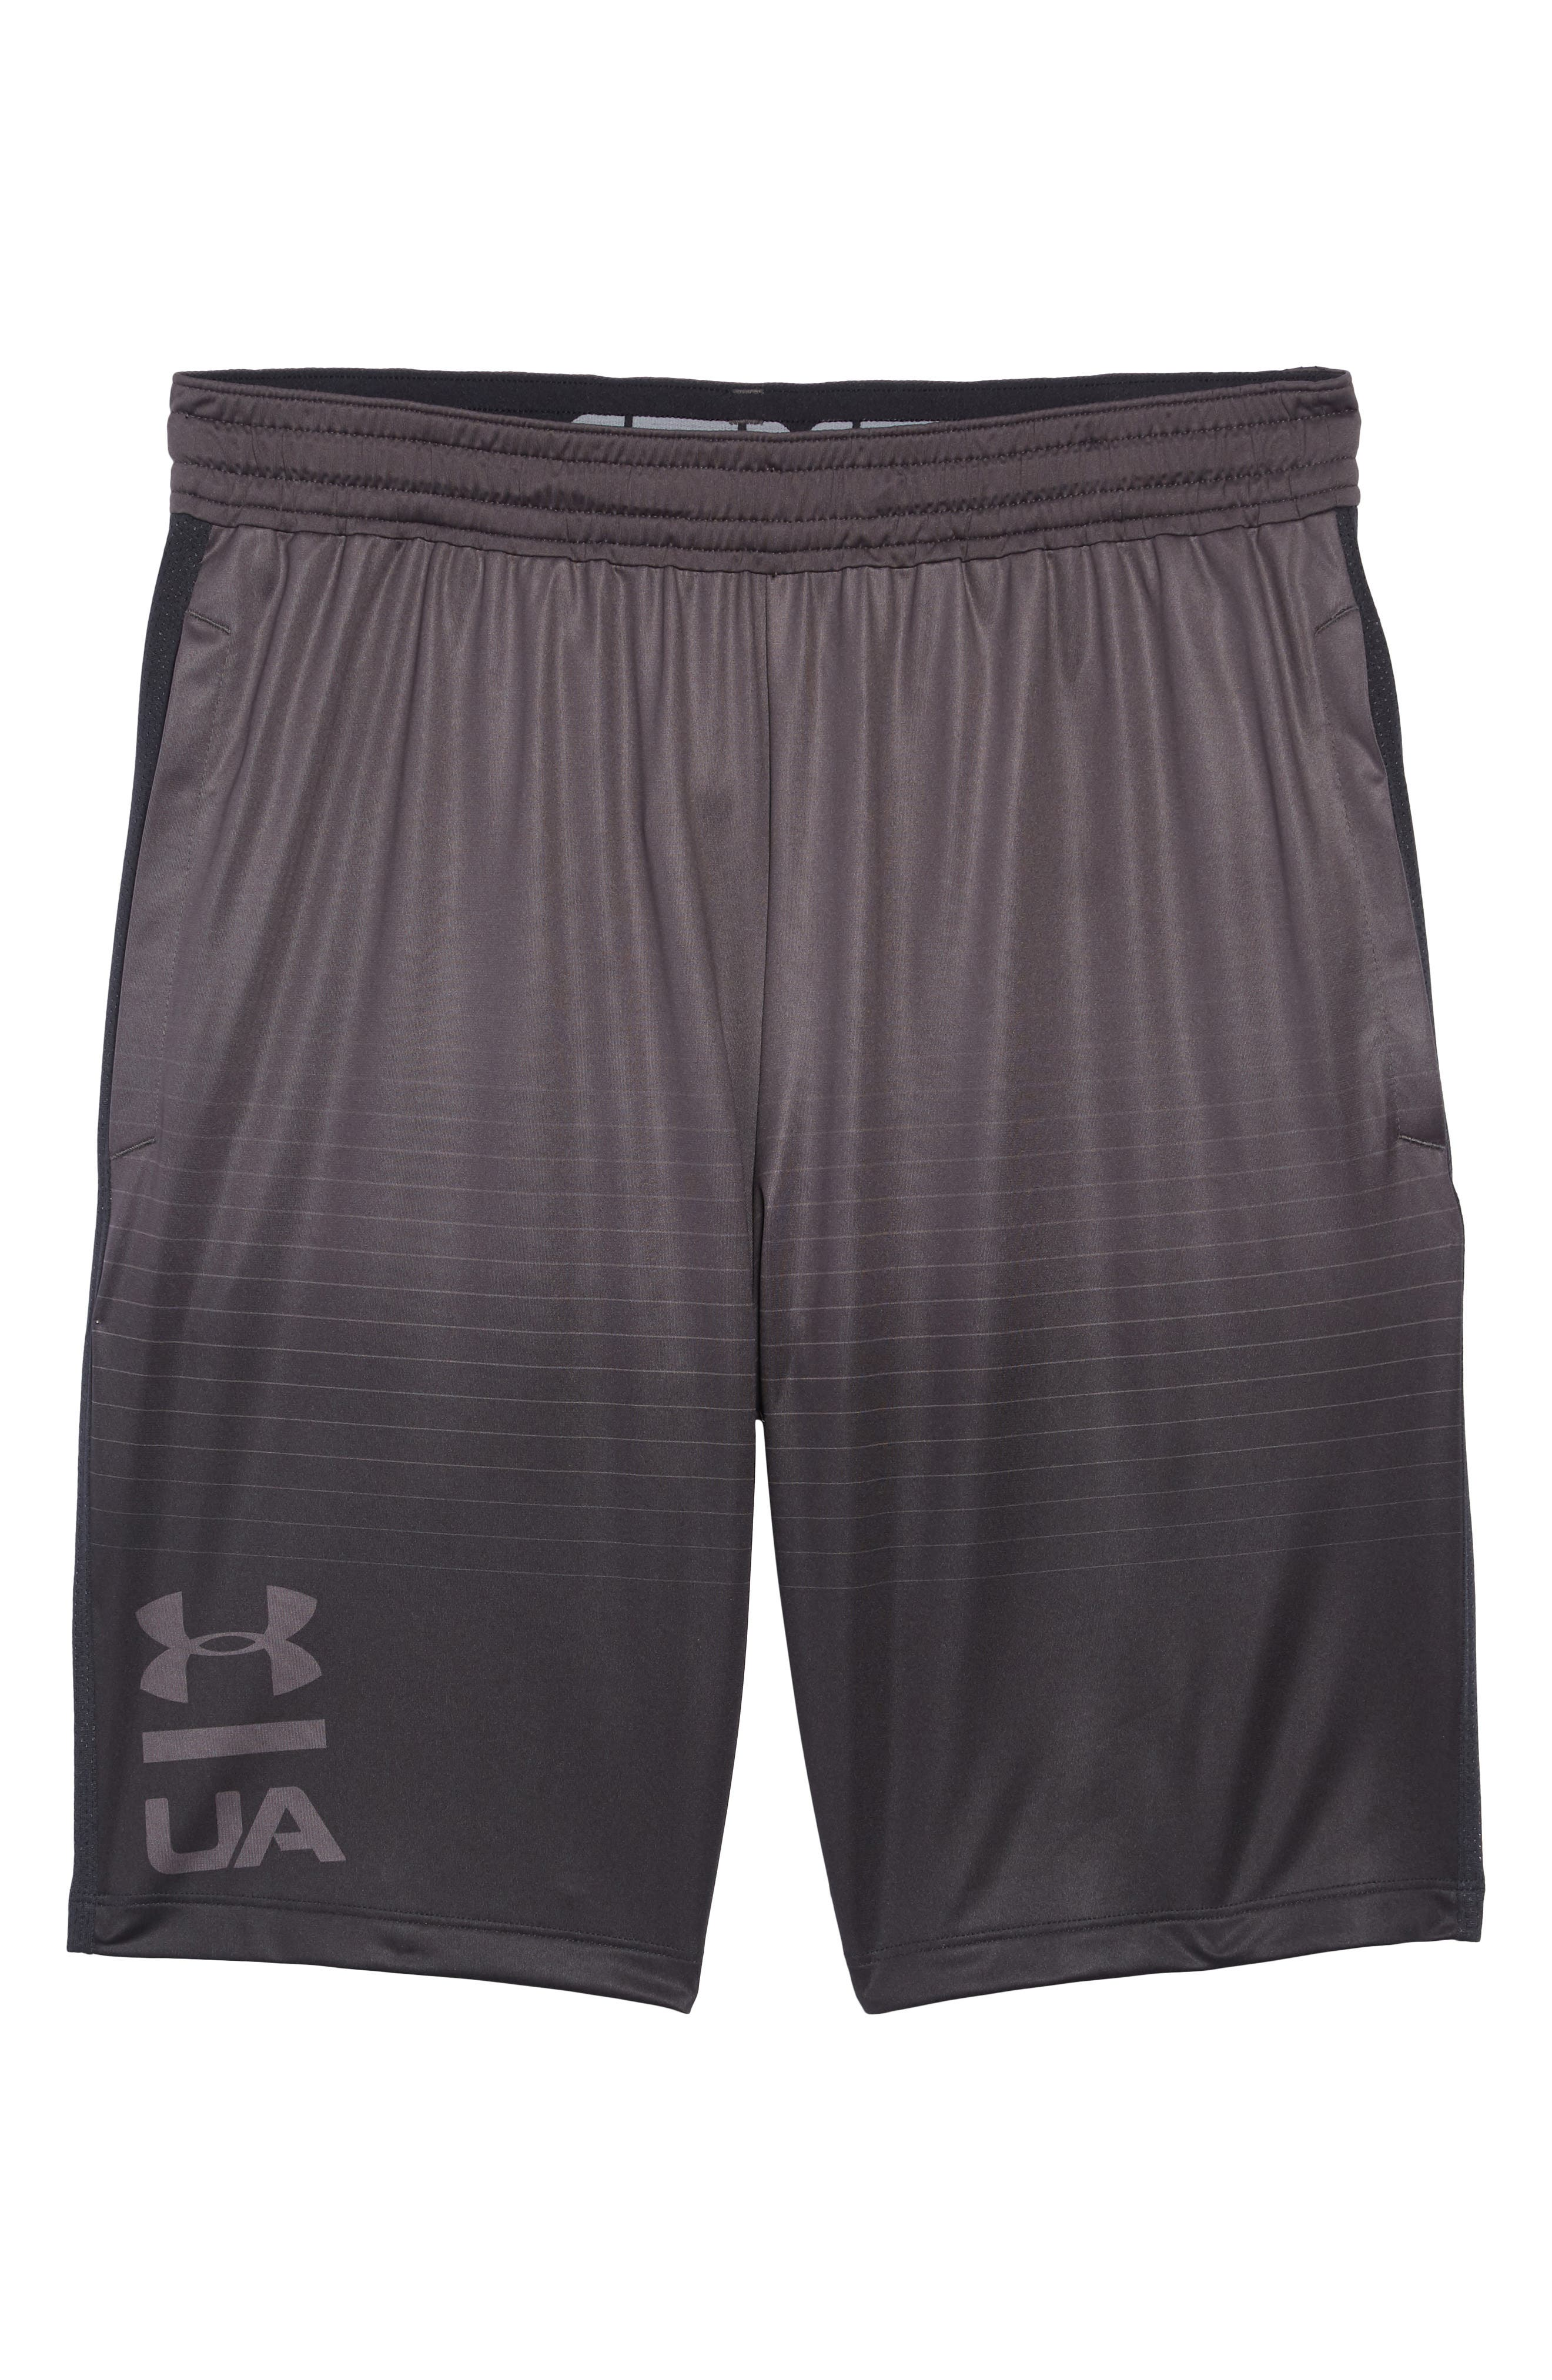 MK-1 Fade Shorts,                             Alternate thumbnail 6, color,                             CHARCOAL